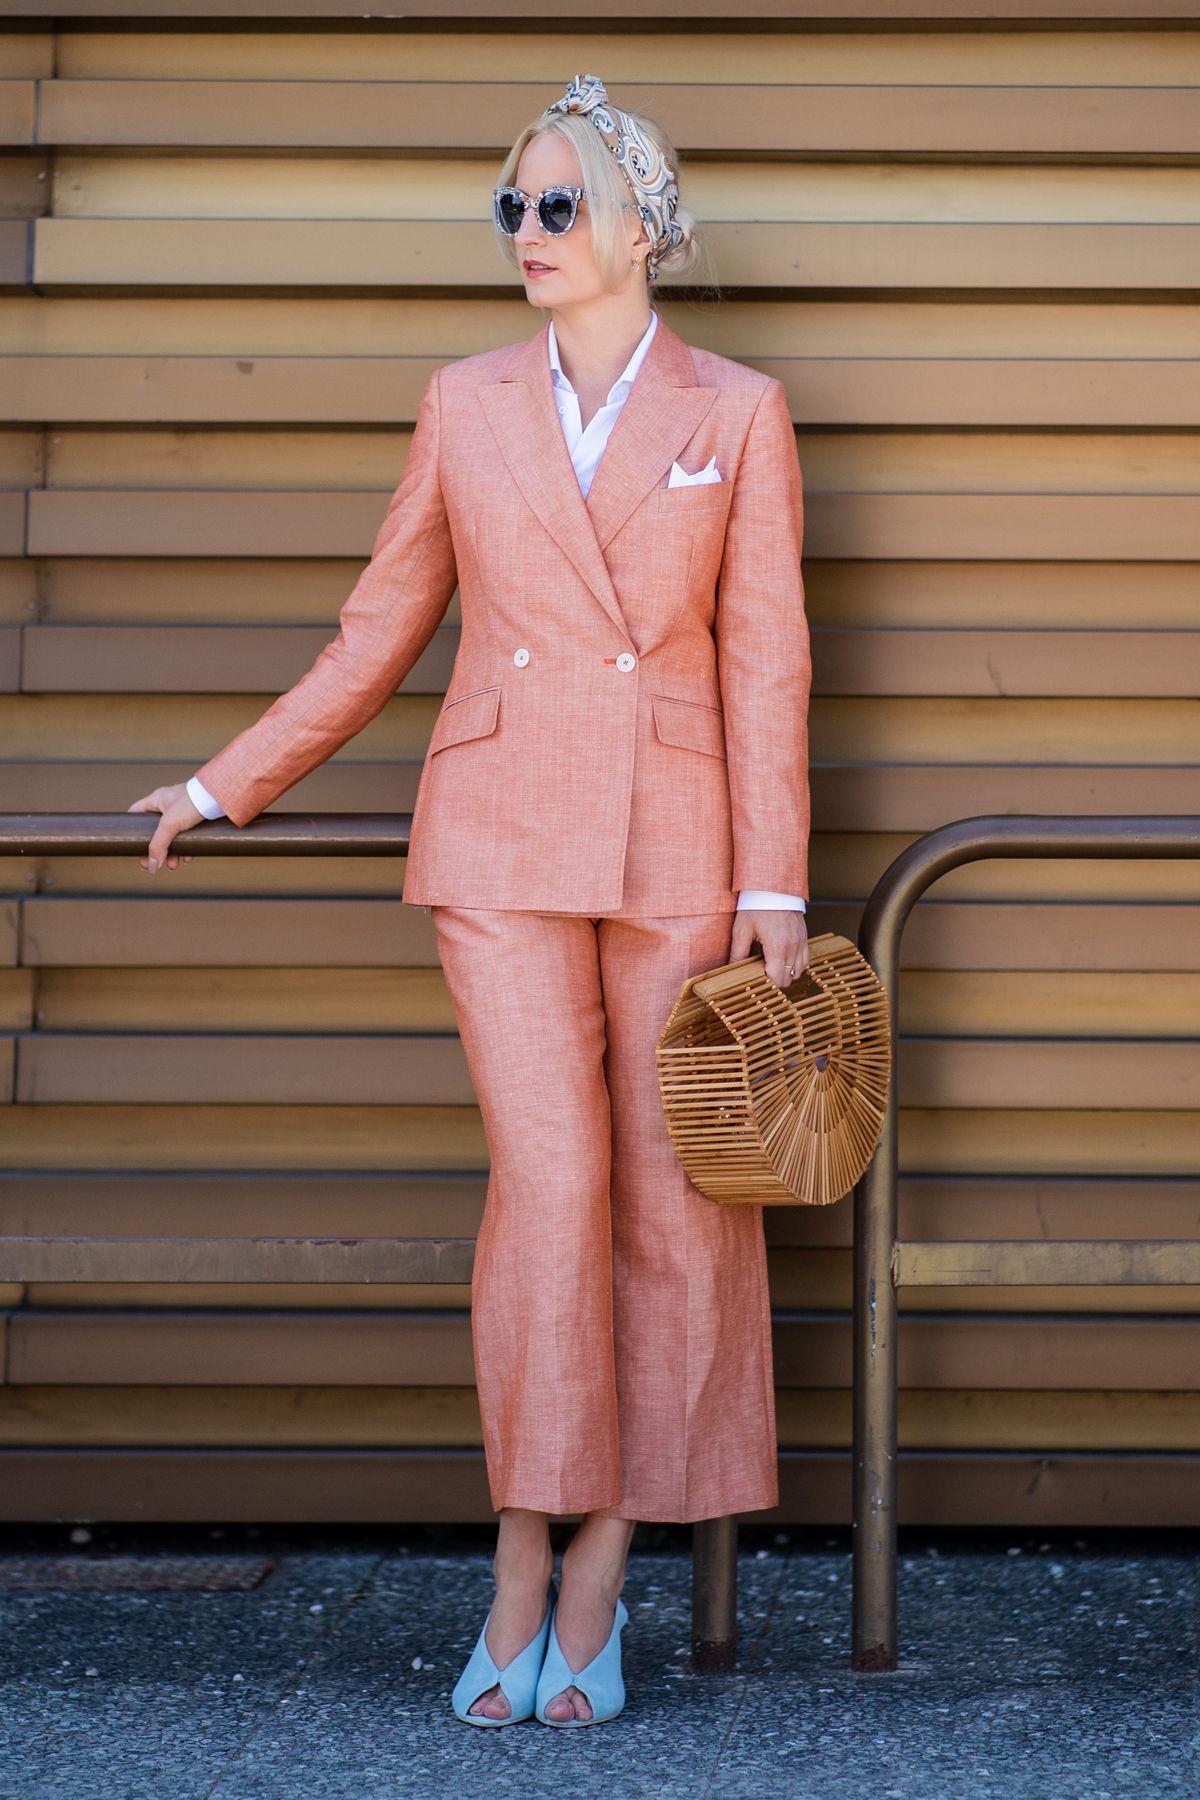 Street Style: June 12 - 94. Pitti Uomo